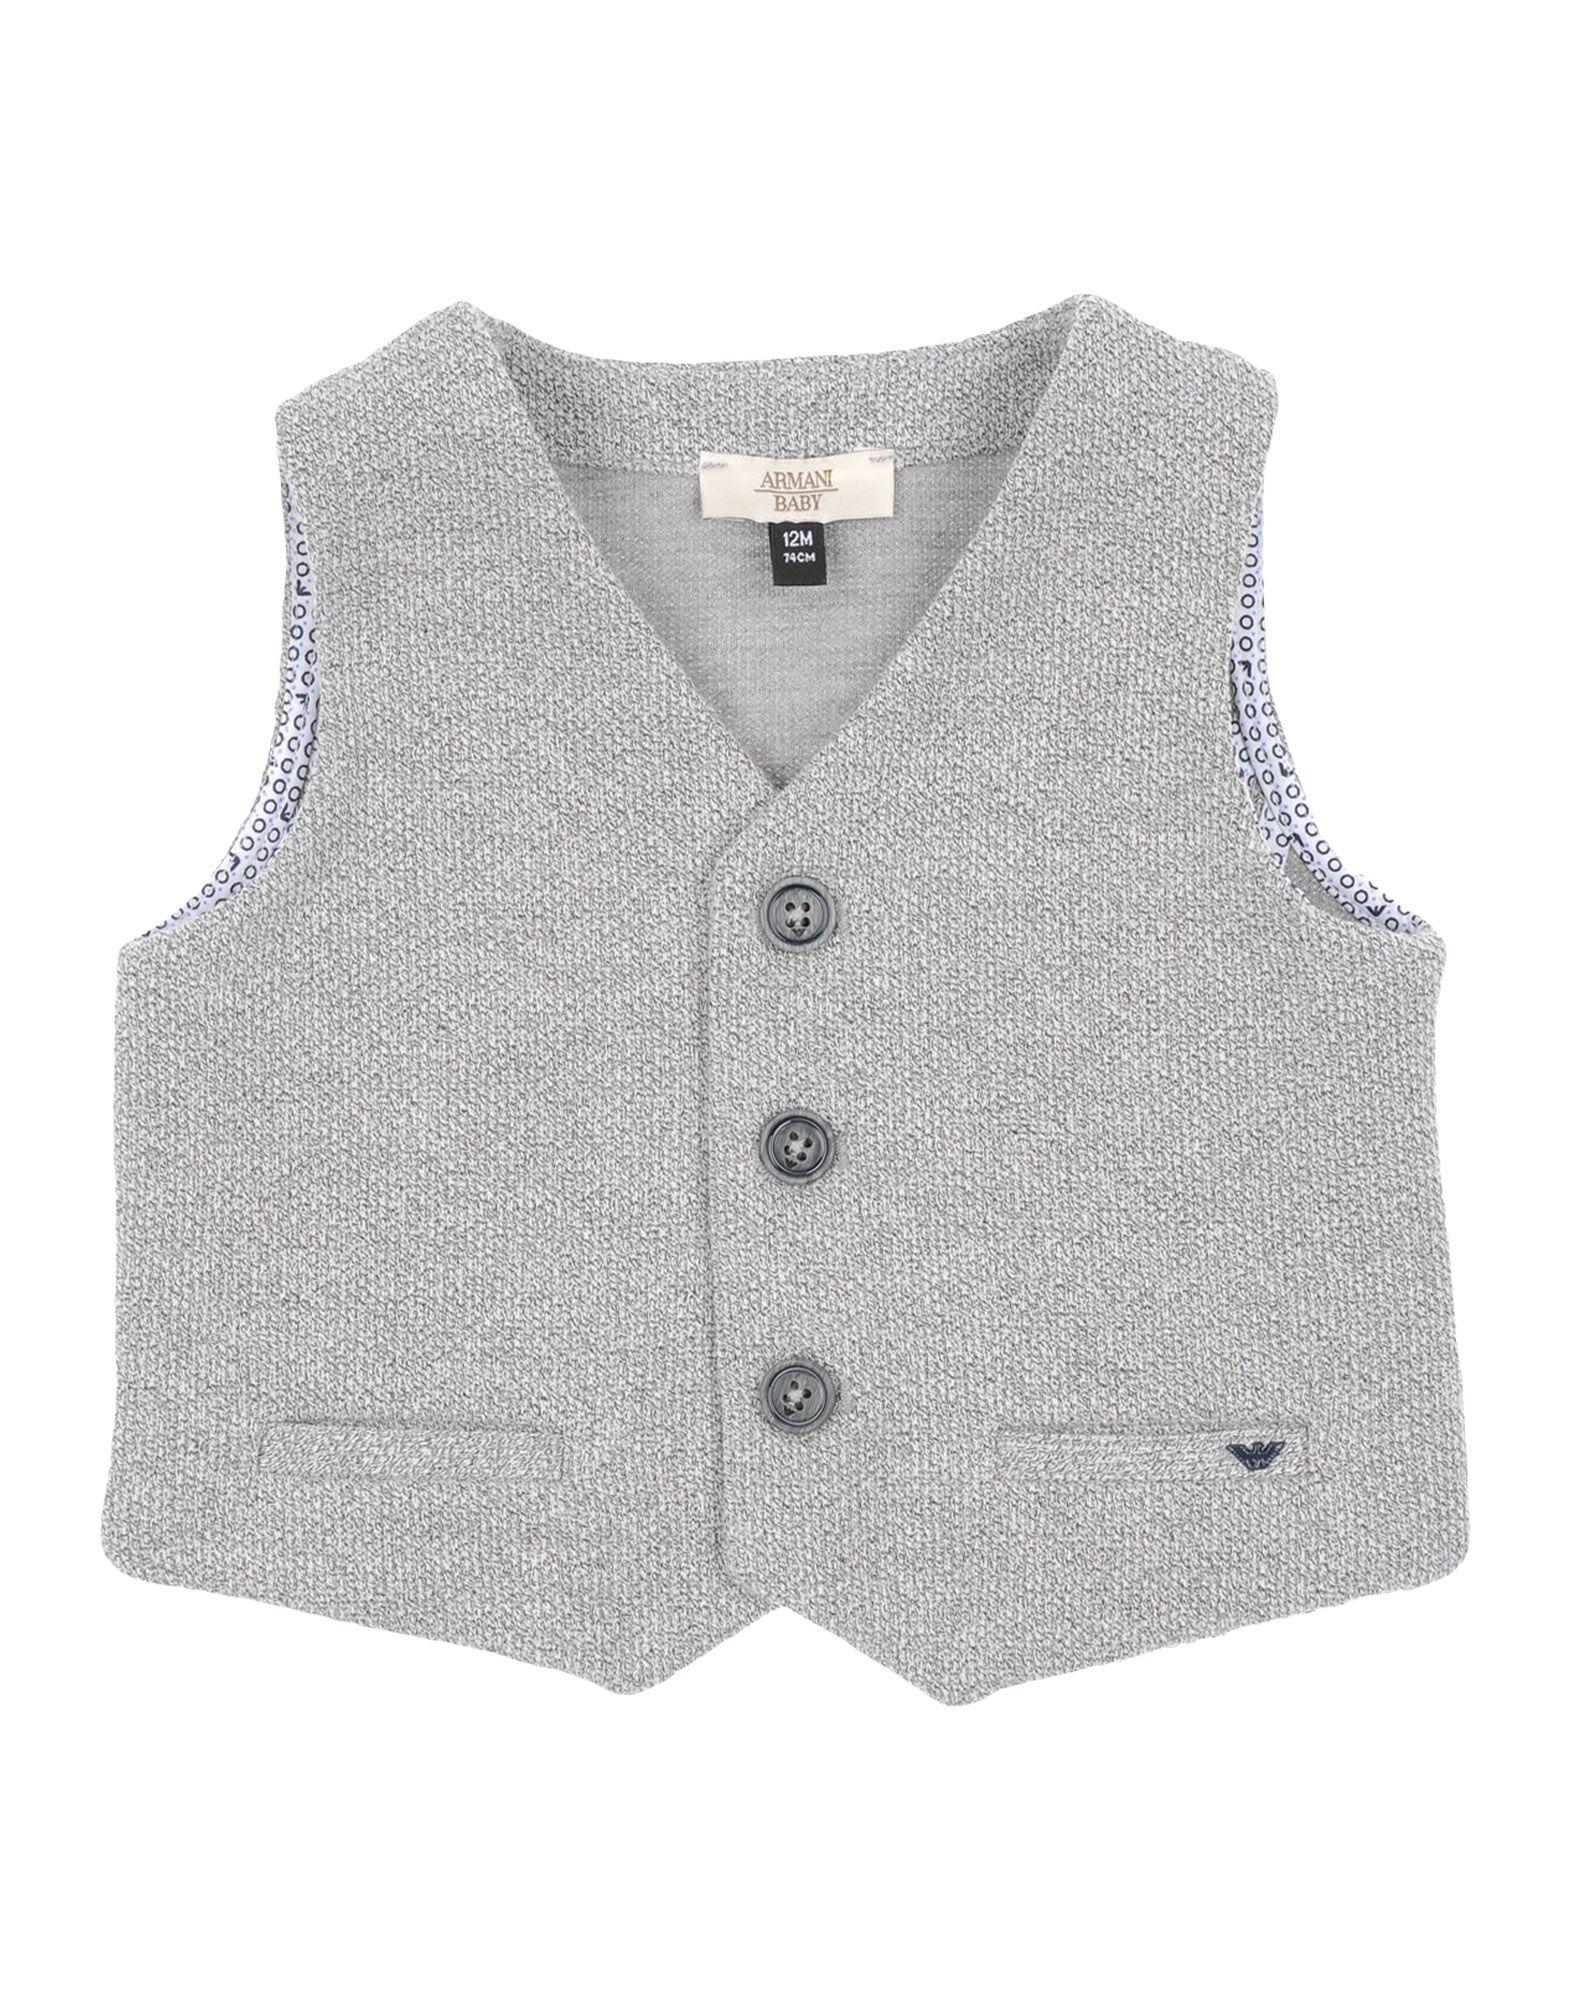 ARMANI JUNIOR Жилет футболка мужская oodji lab цвет белый 5l611351m 39485n 1079p размер xs 44